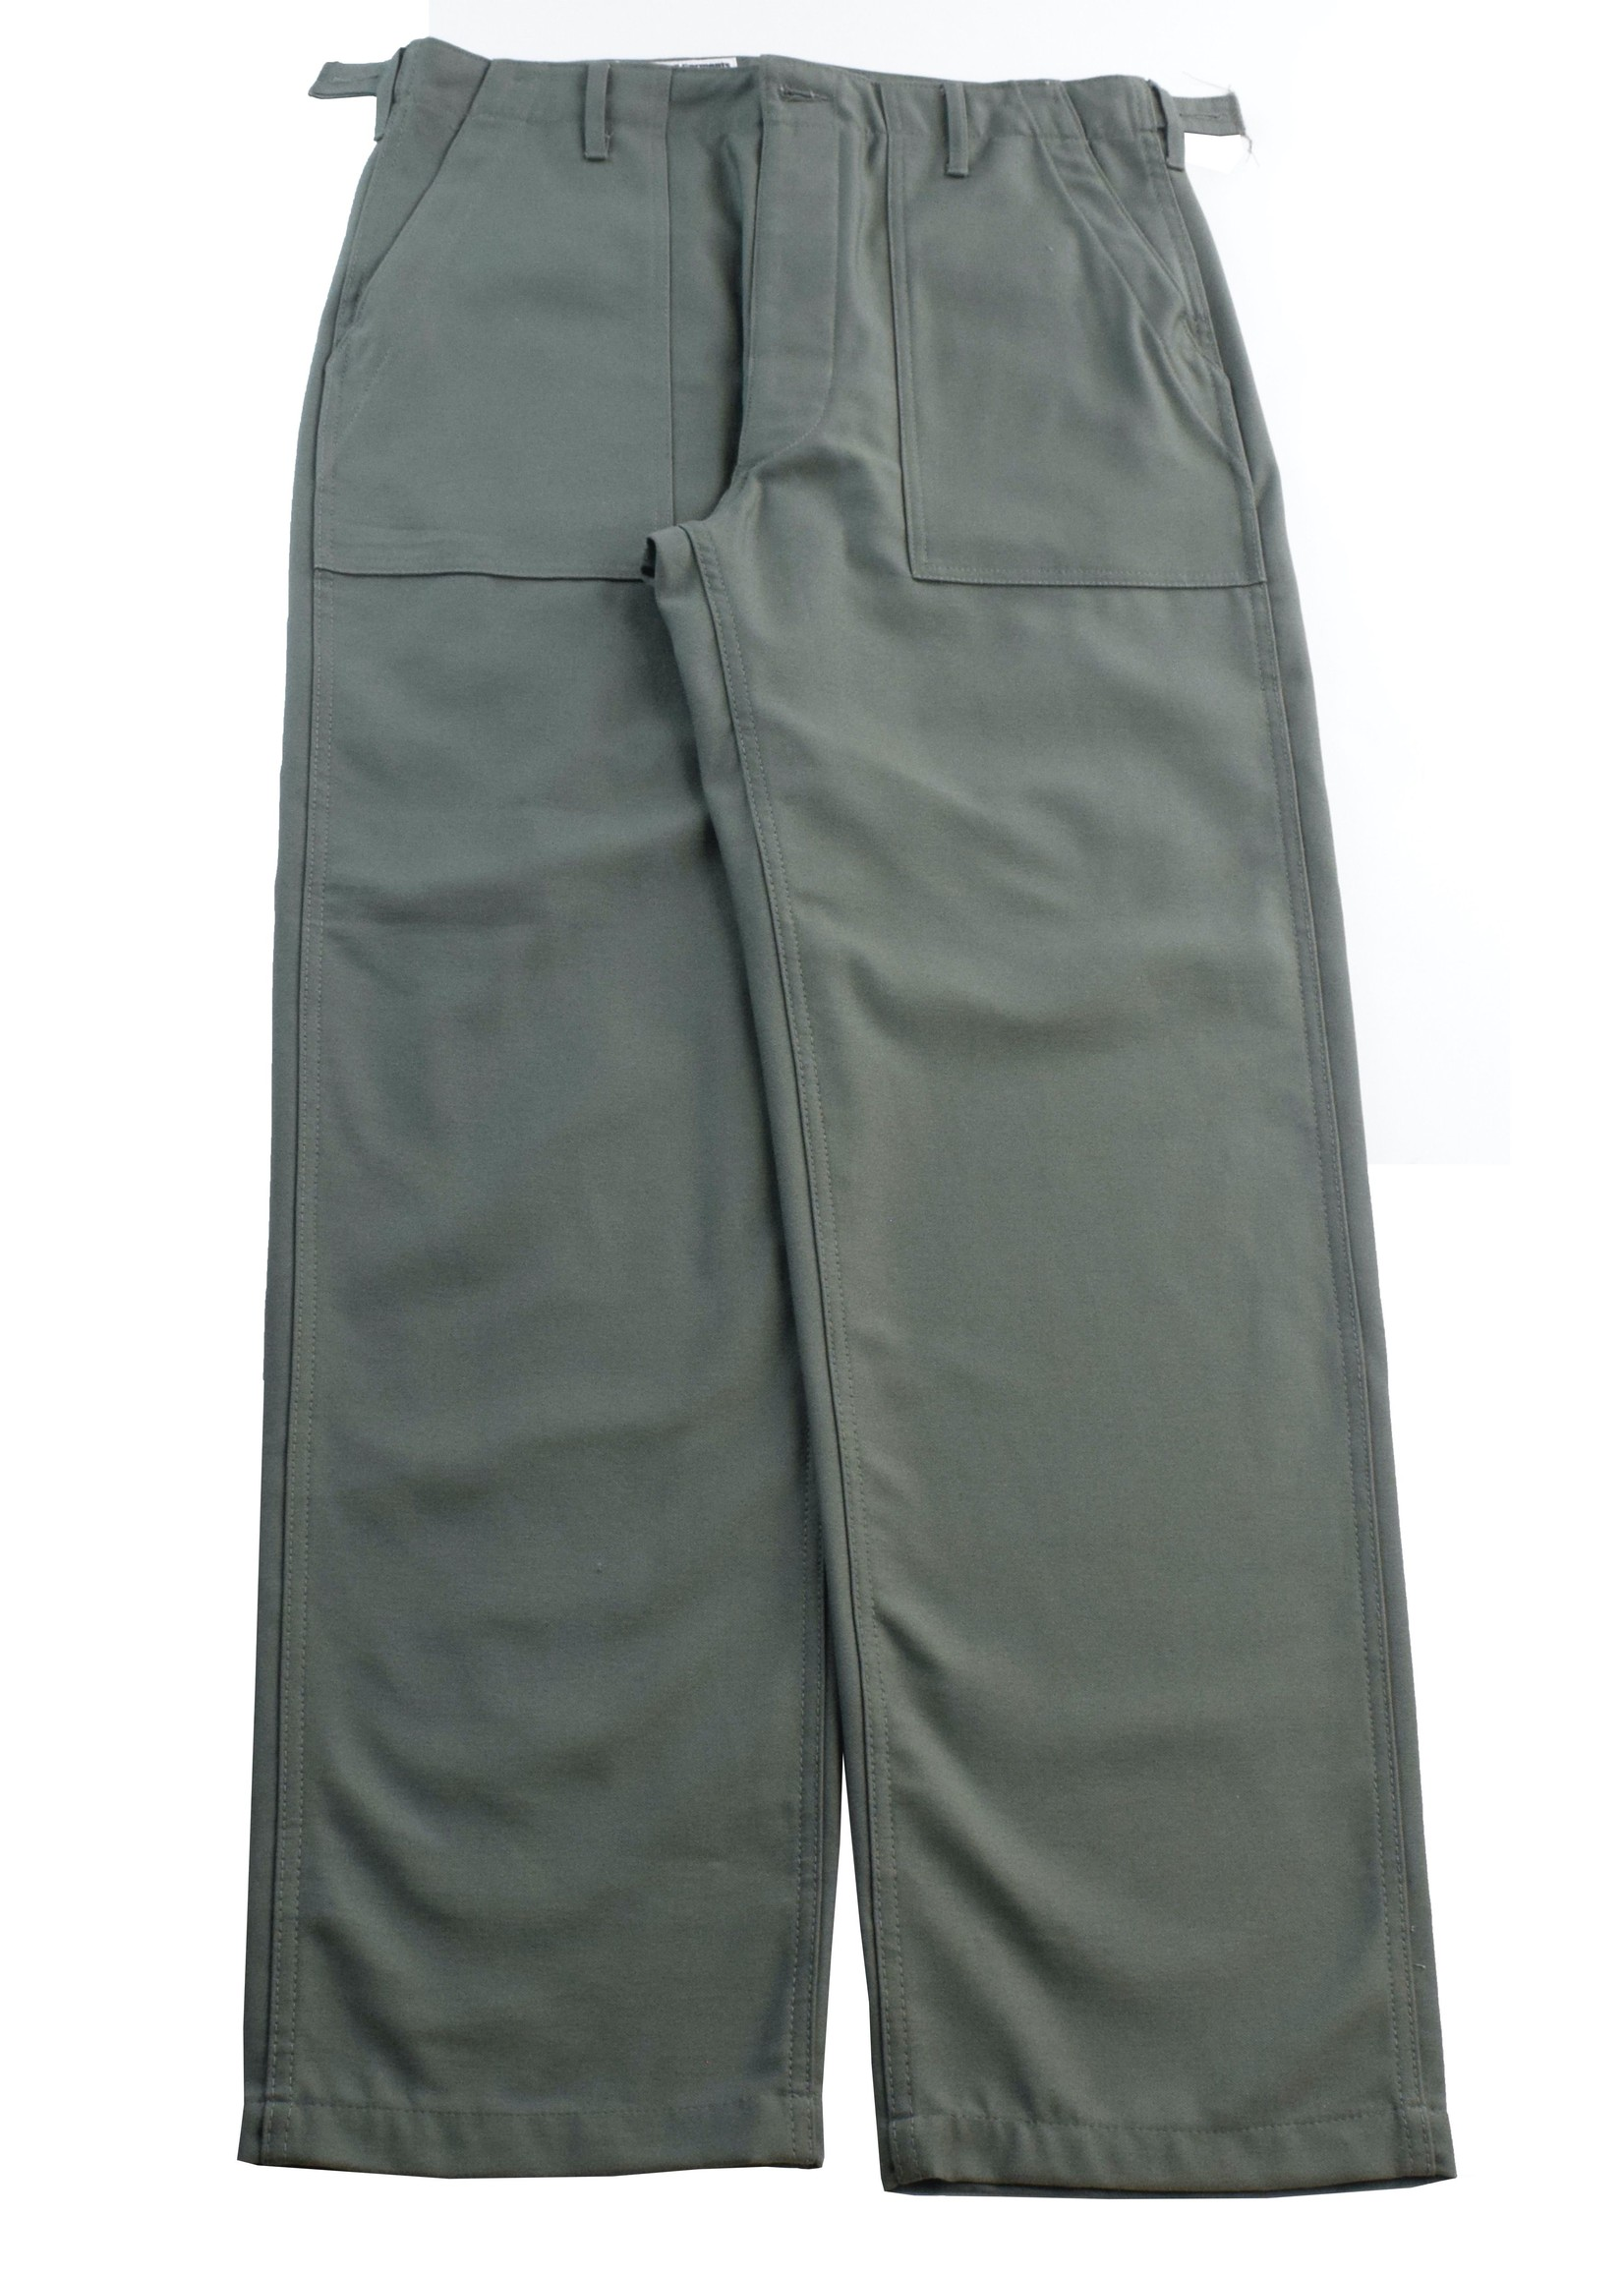 Engineered Garments EG Workaday Fatigues Olive Reverse Sateen